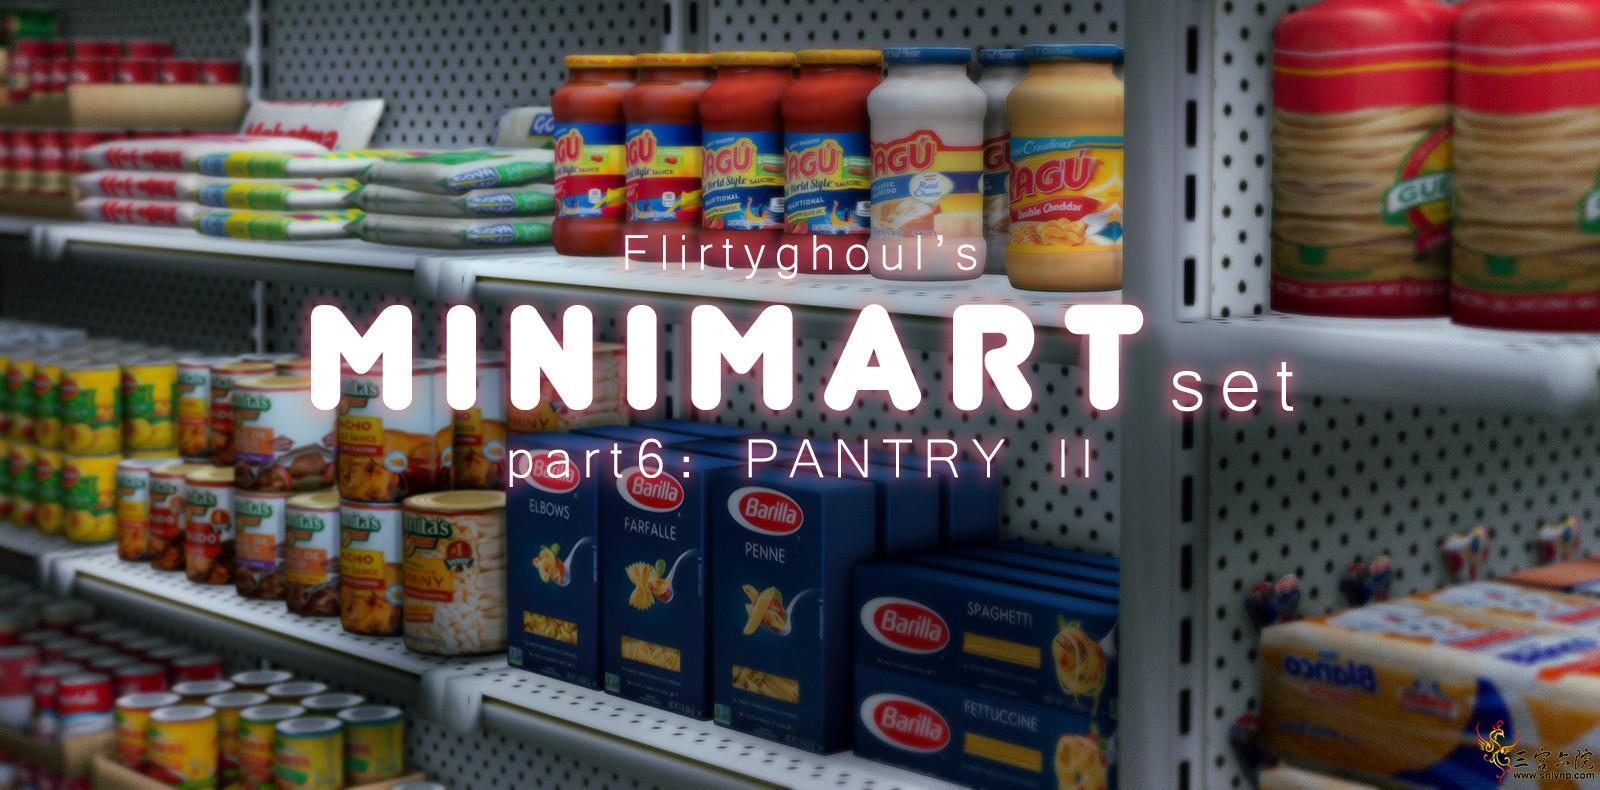 FG_Minimart_PART6_PANTRY2SET_prev1.png